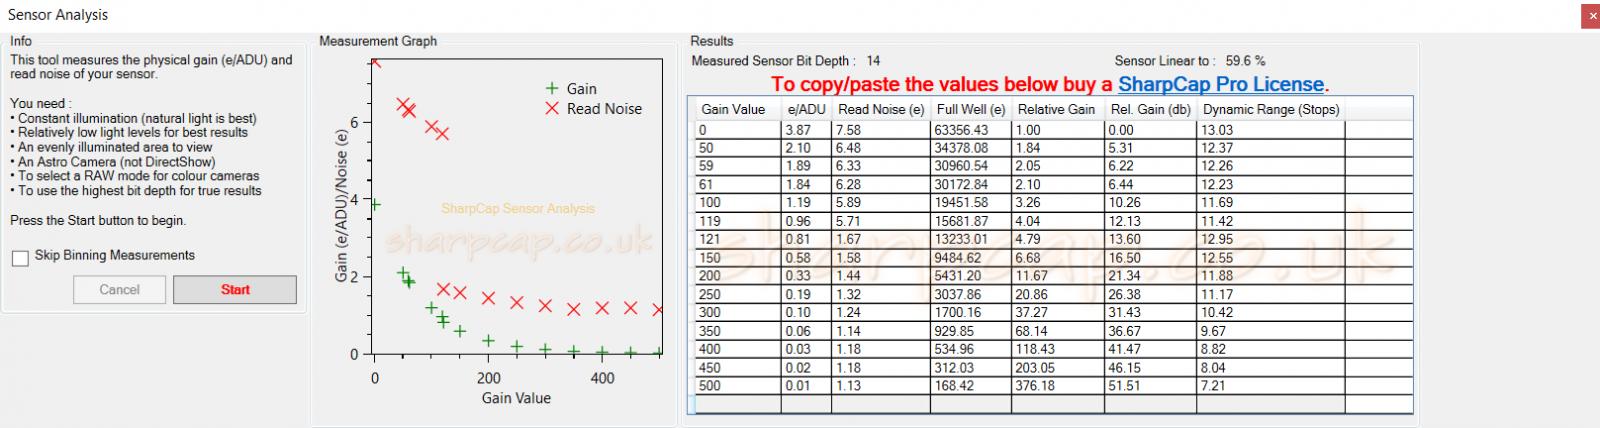 sensor_analys_sharpcap.thumb.png.2d7476786528a862abac6caaa031f470.png